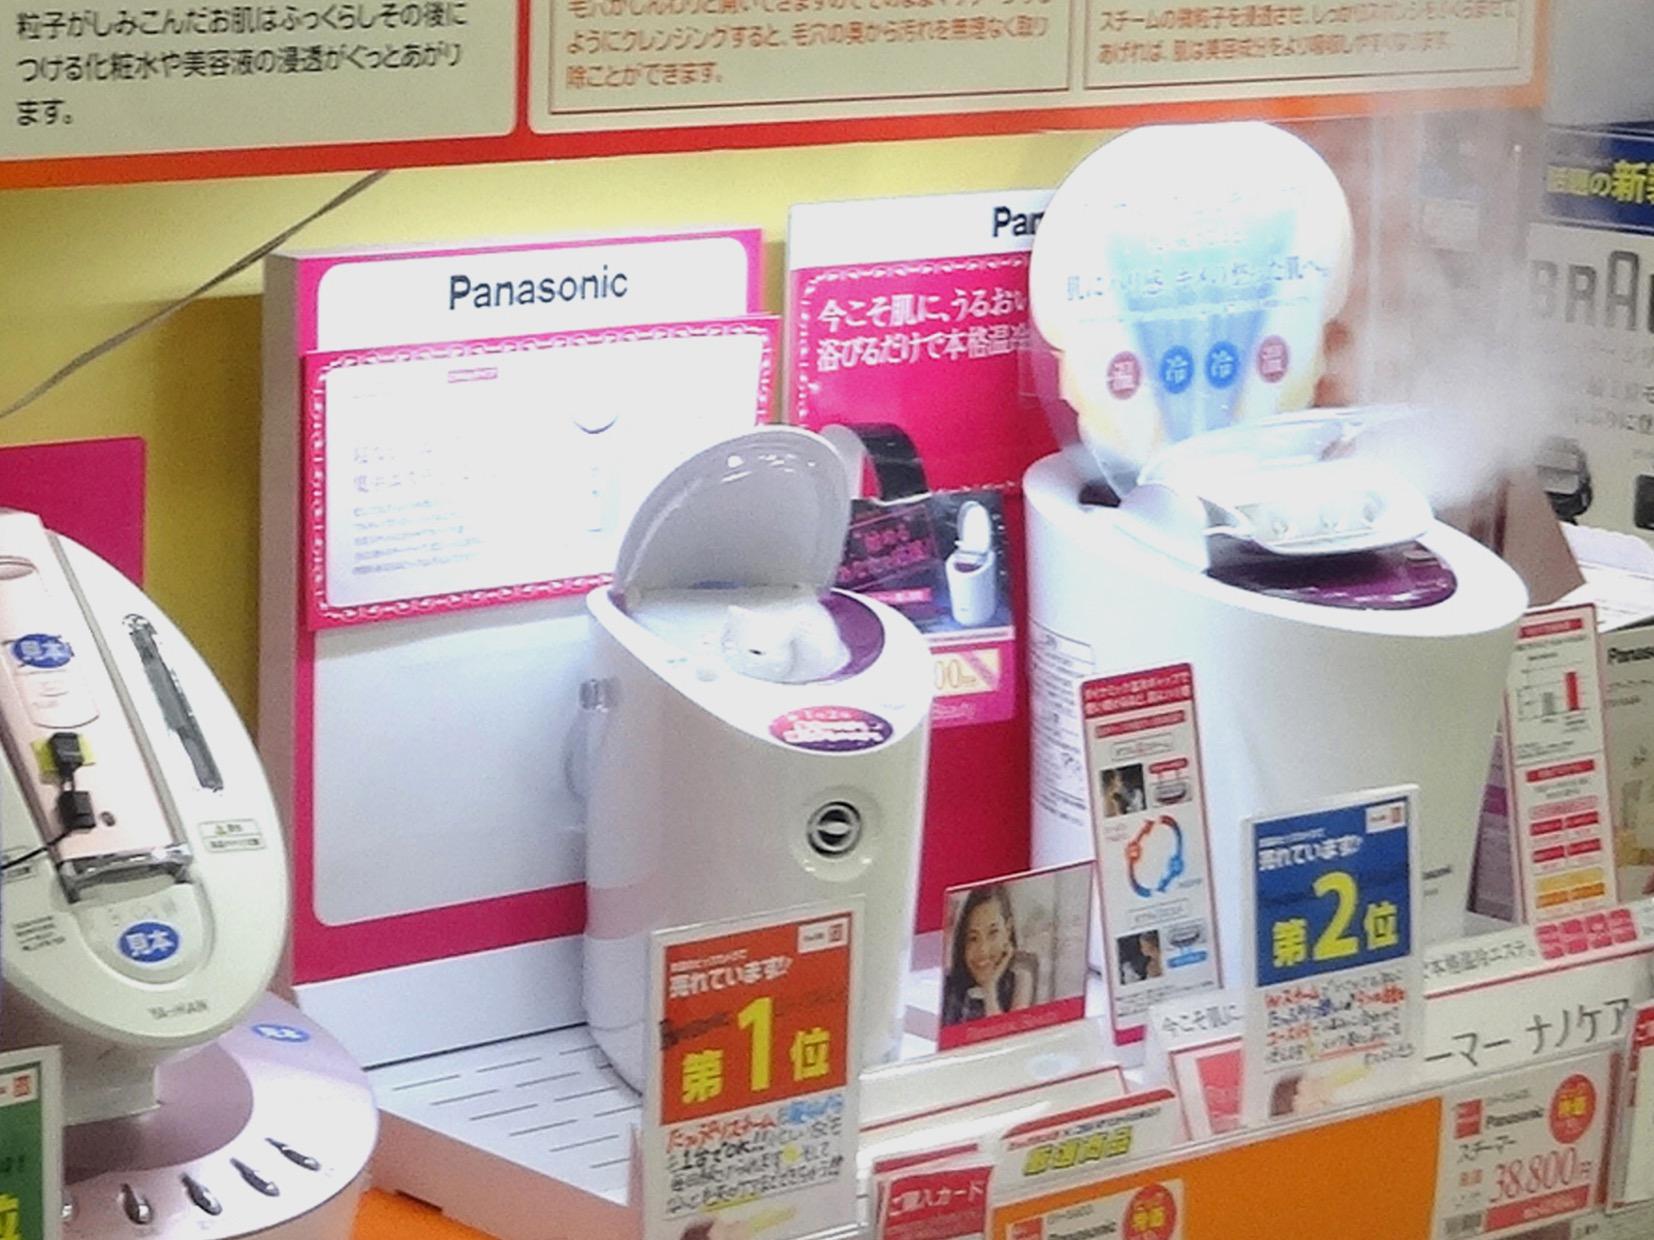 BICCAMERA Shin-Yokohama Store